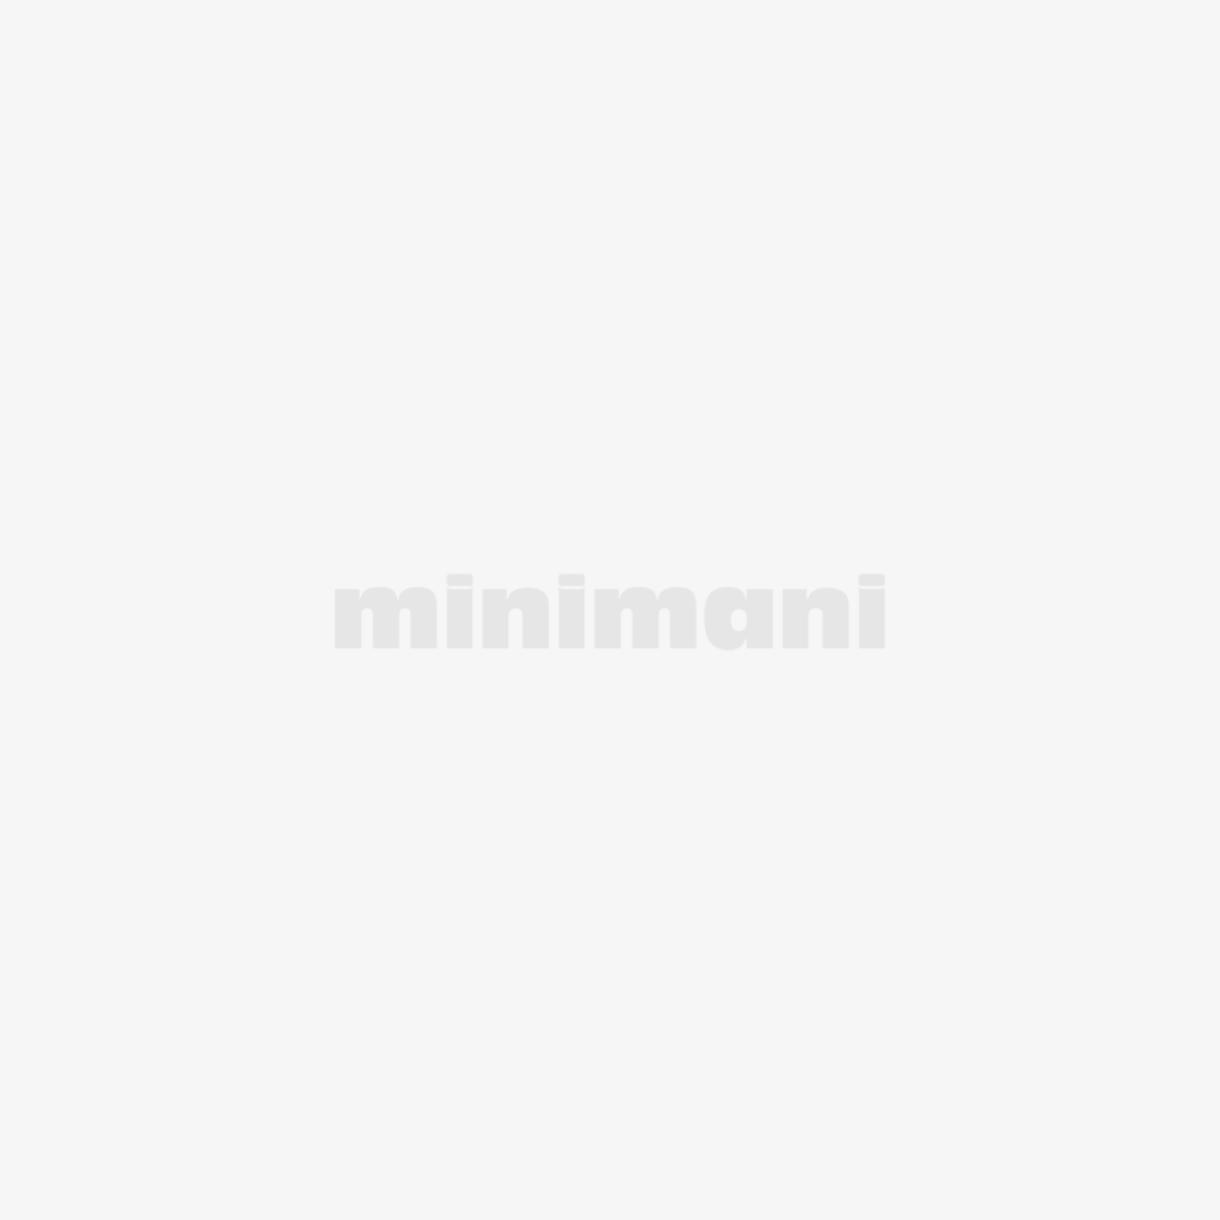 Jiffy-7 Refill turvepelletit 36mm 36kpl/pkt